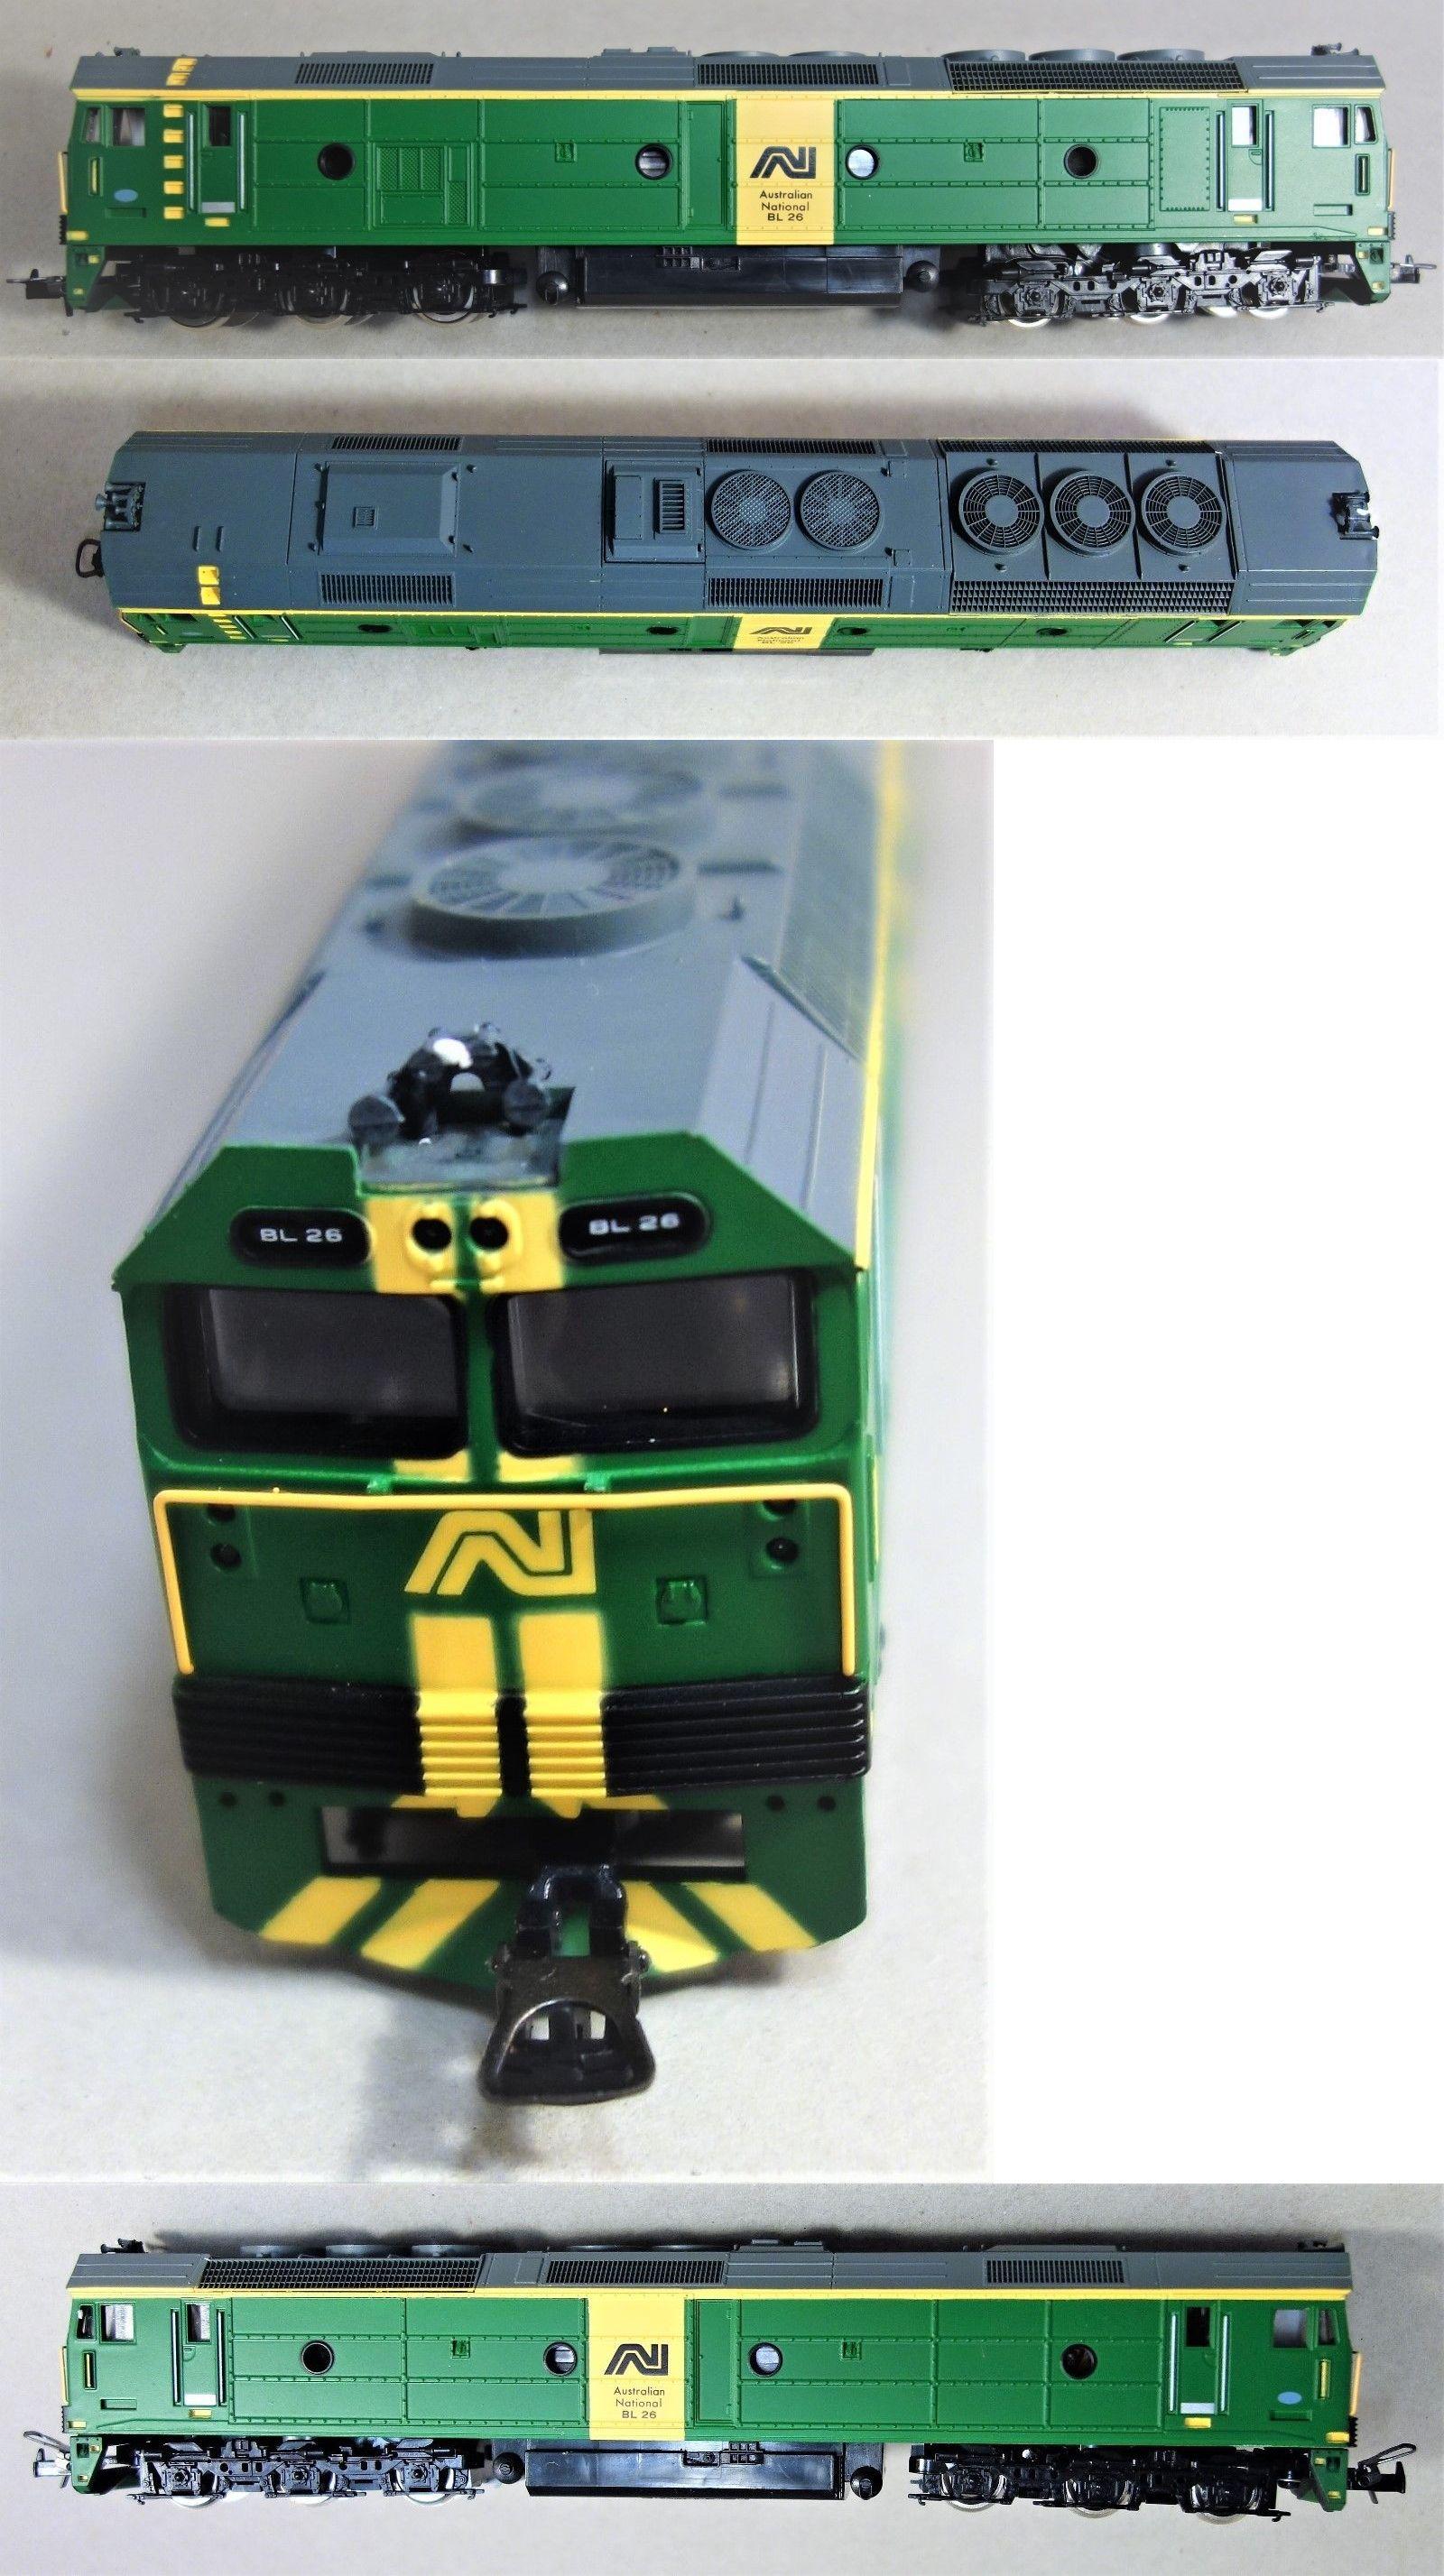 Oo Scale 122601 Powerline Ho P214 Bl26 Class Australian Nat L Bob Hawke Ltd Ed Dual Motor Nib Buy It Now Only 134 9 10 Year Plan Model Railroad Bob Hawke